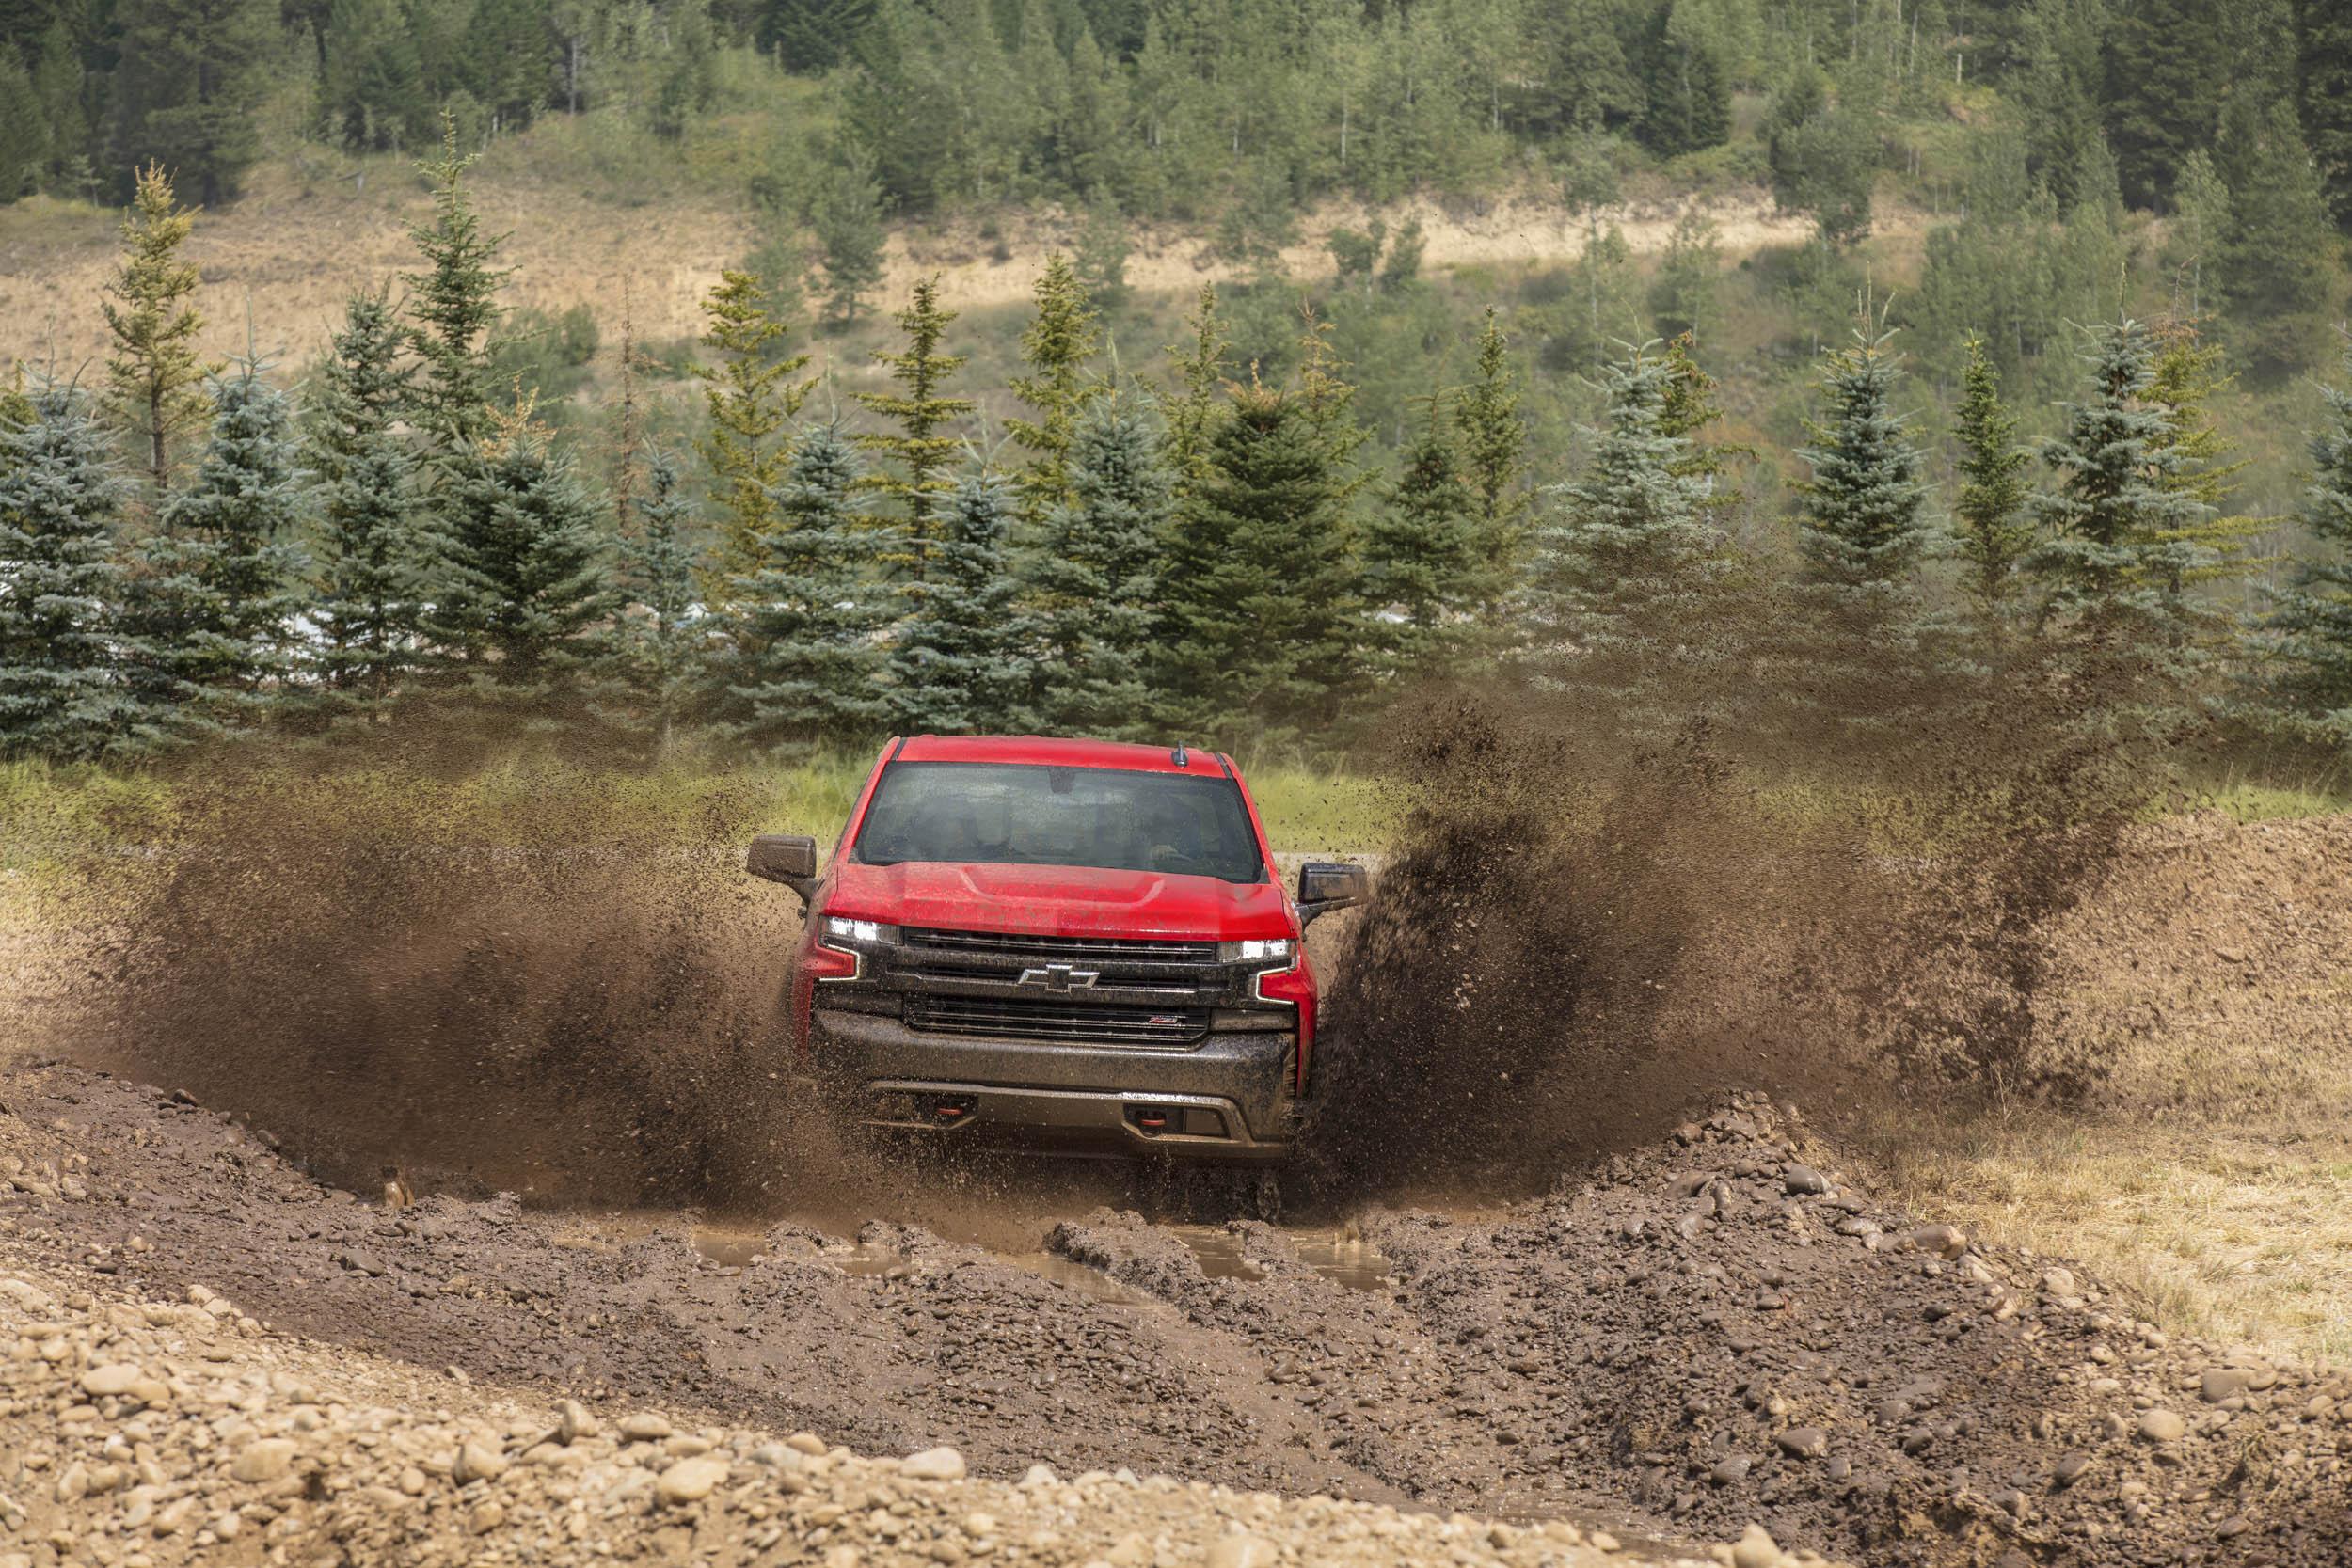 2019 chevrolet silverado Trail Boss in mud